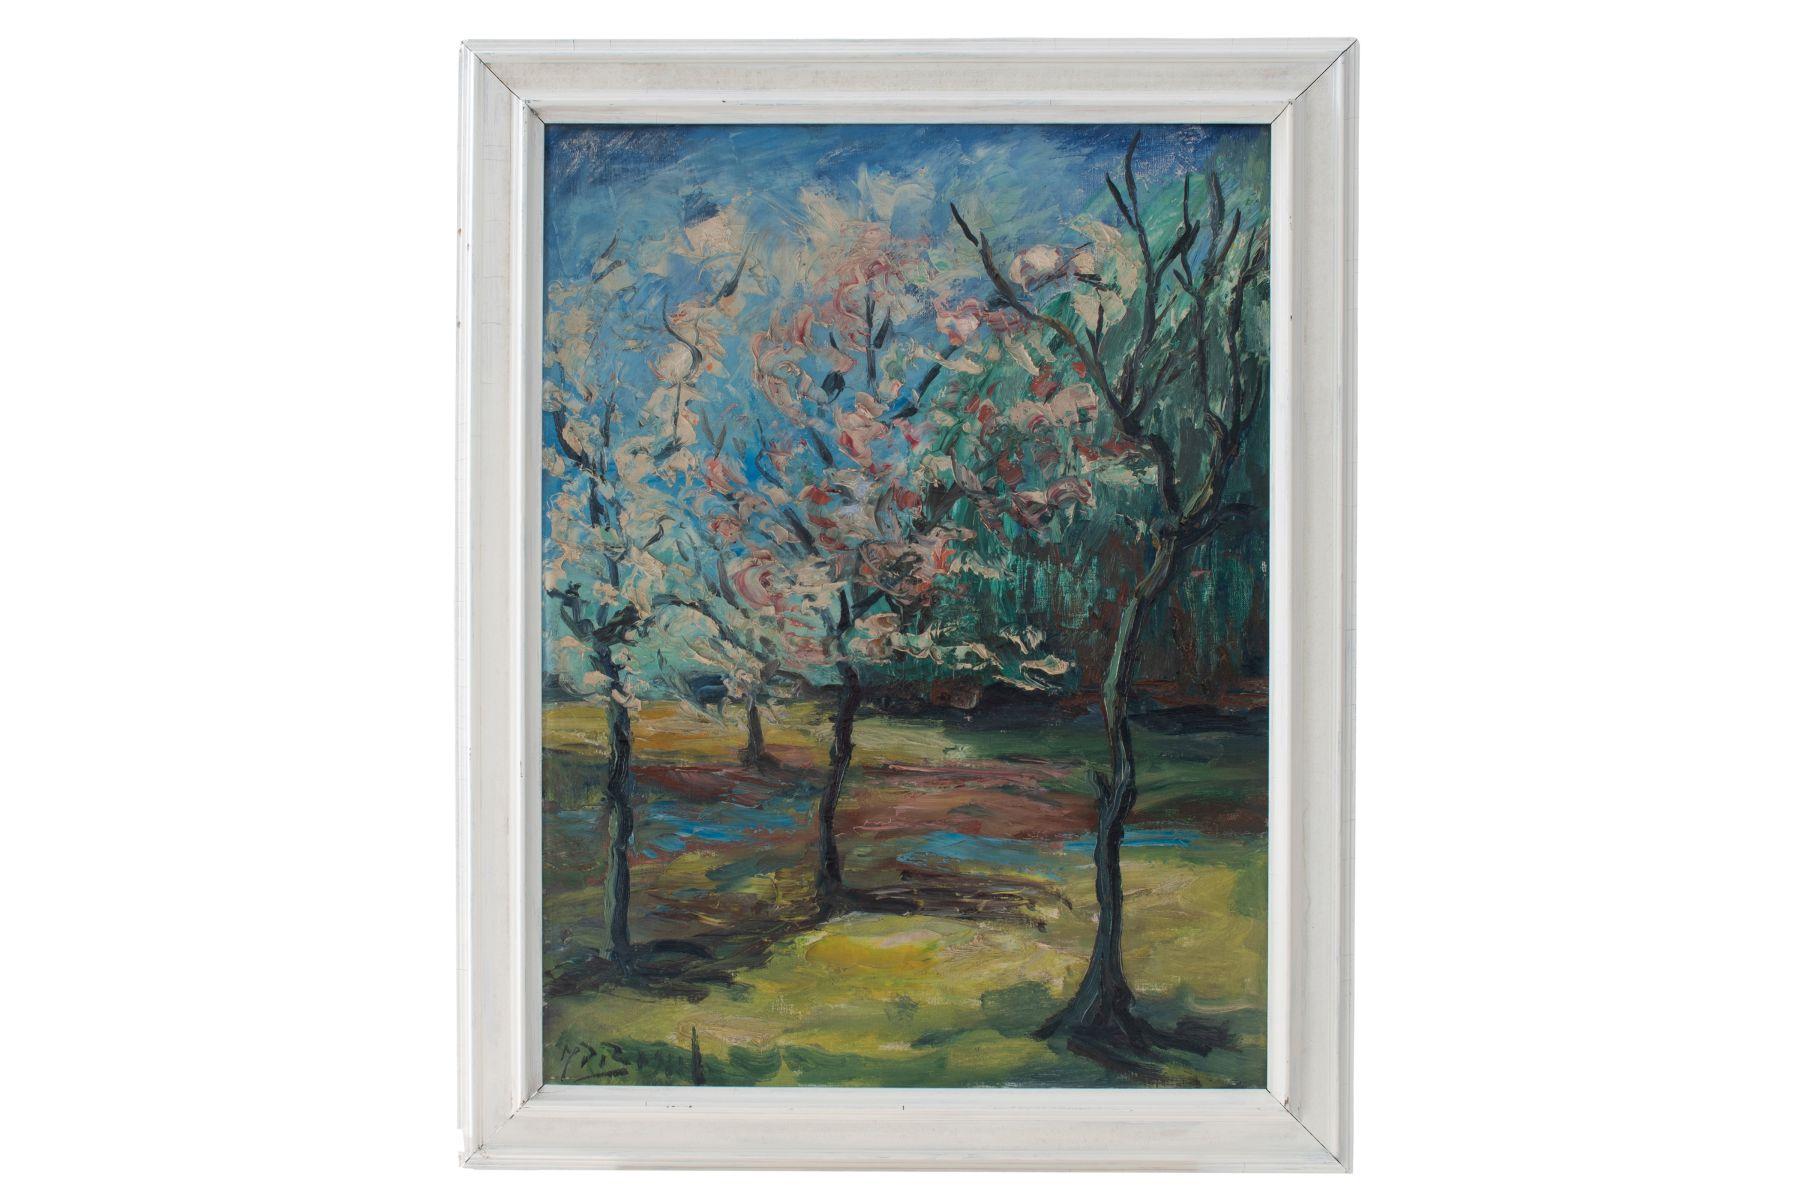 "#101 Rudolf Raimund Ballabene (1890-1968) ""Flowering fruit trees"" | Rudolf Raimund Ballabene (1890-1968) ""Blühende Obstbäume"" Image"